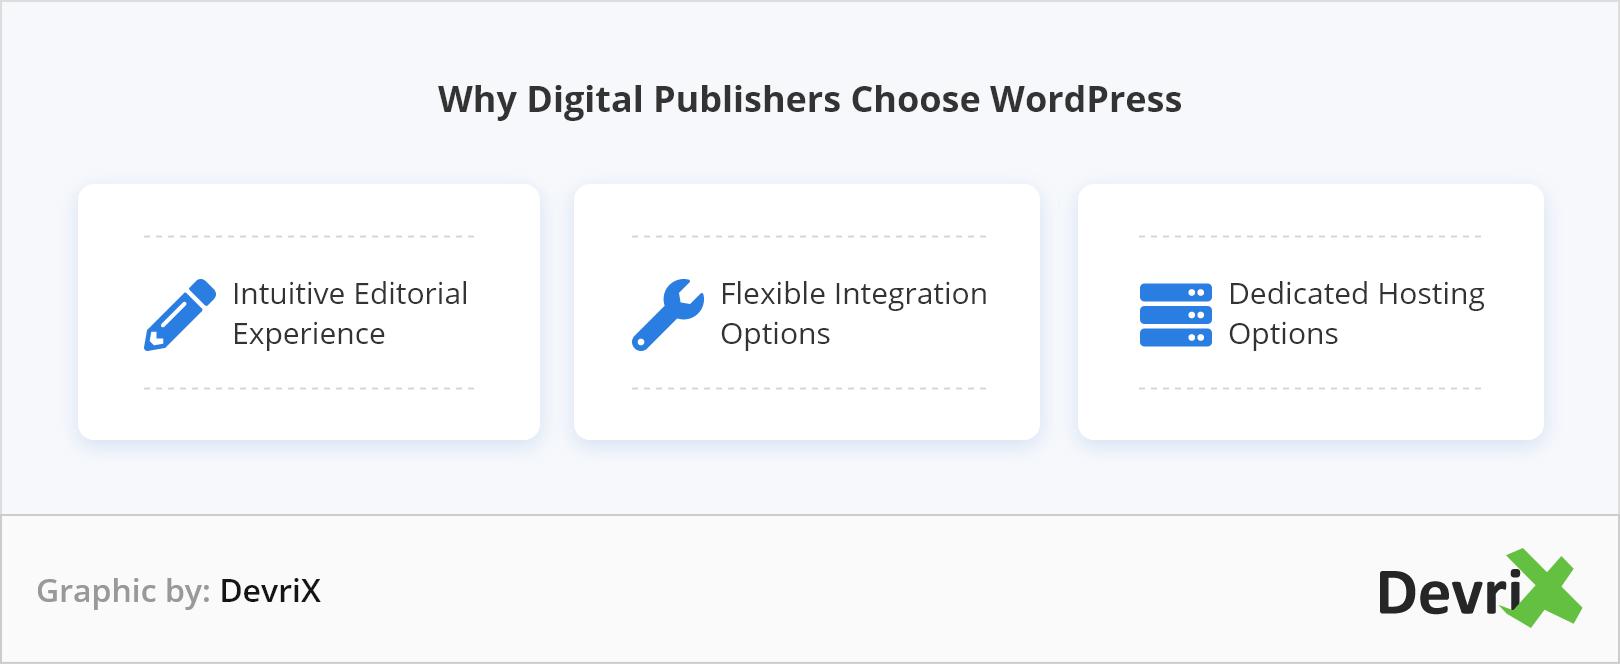 Why Digital Publishers Choose WordPress